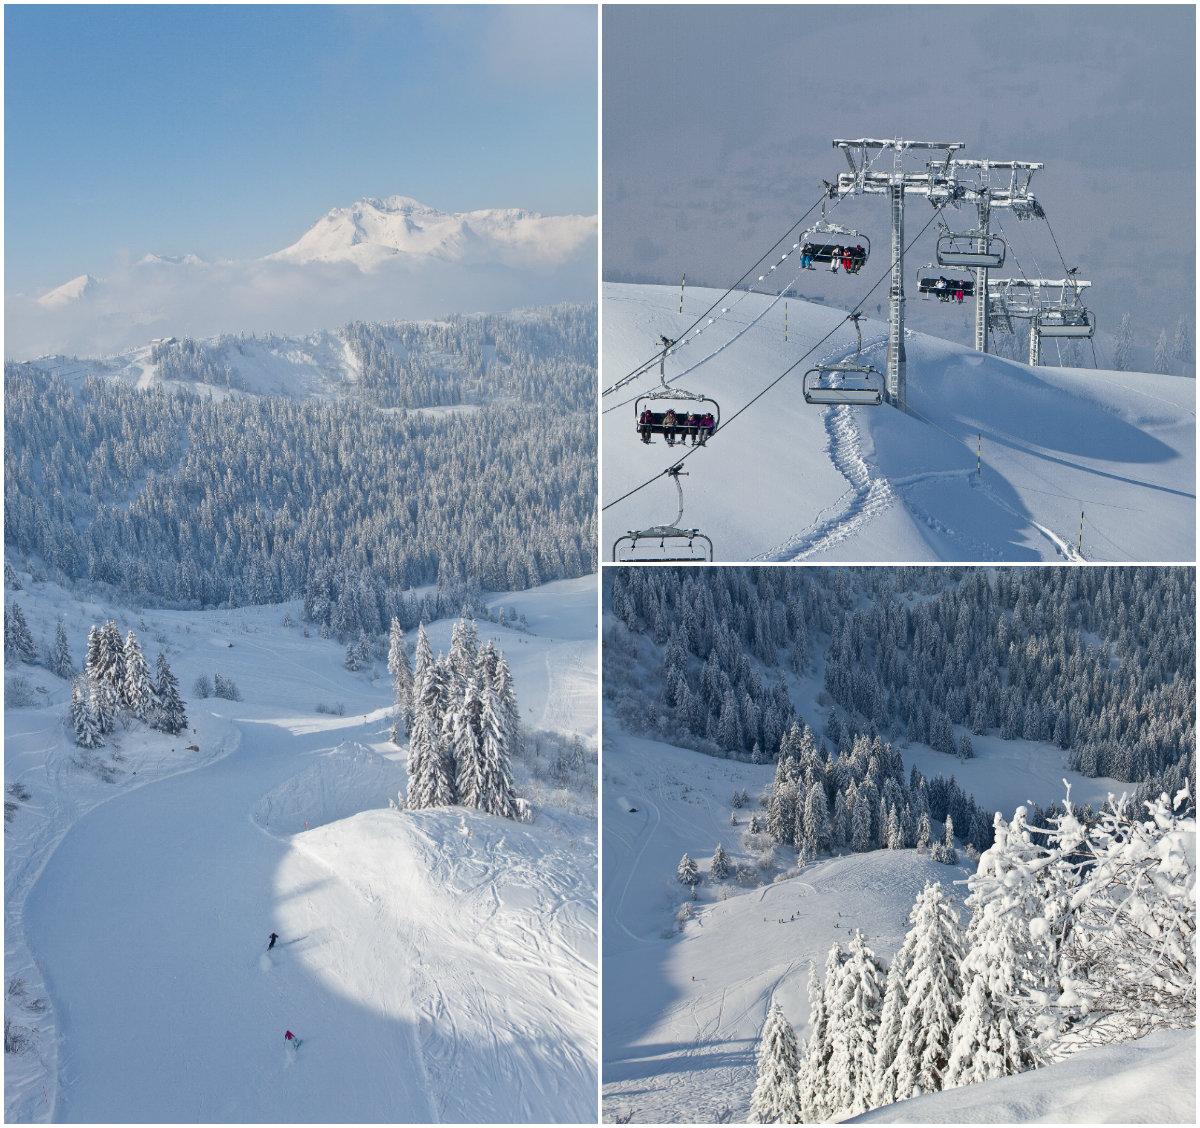 Geheime zone Chamossière in skigebied Morzine Portes du Soleil